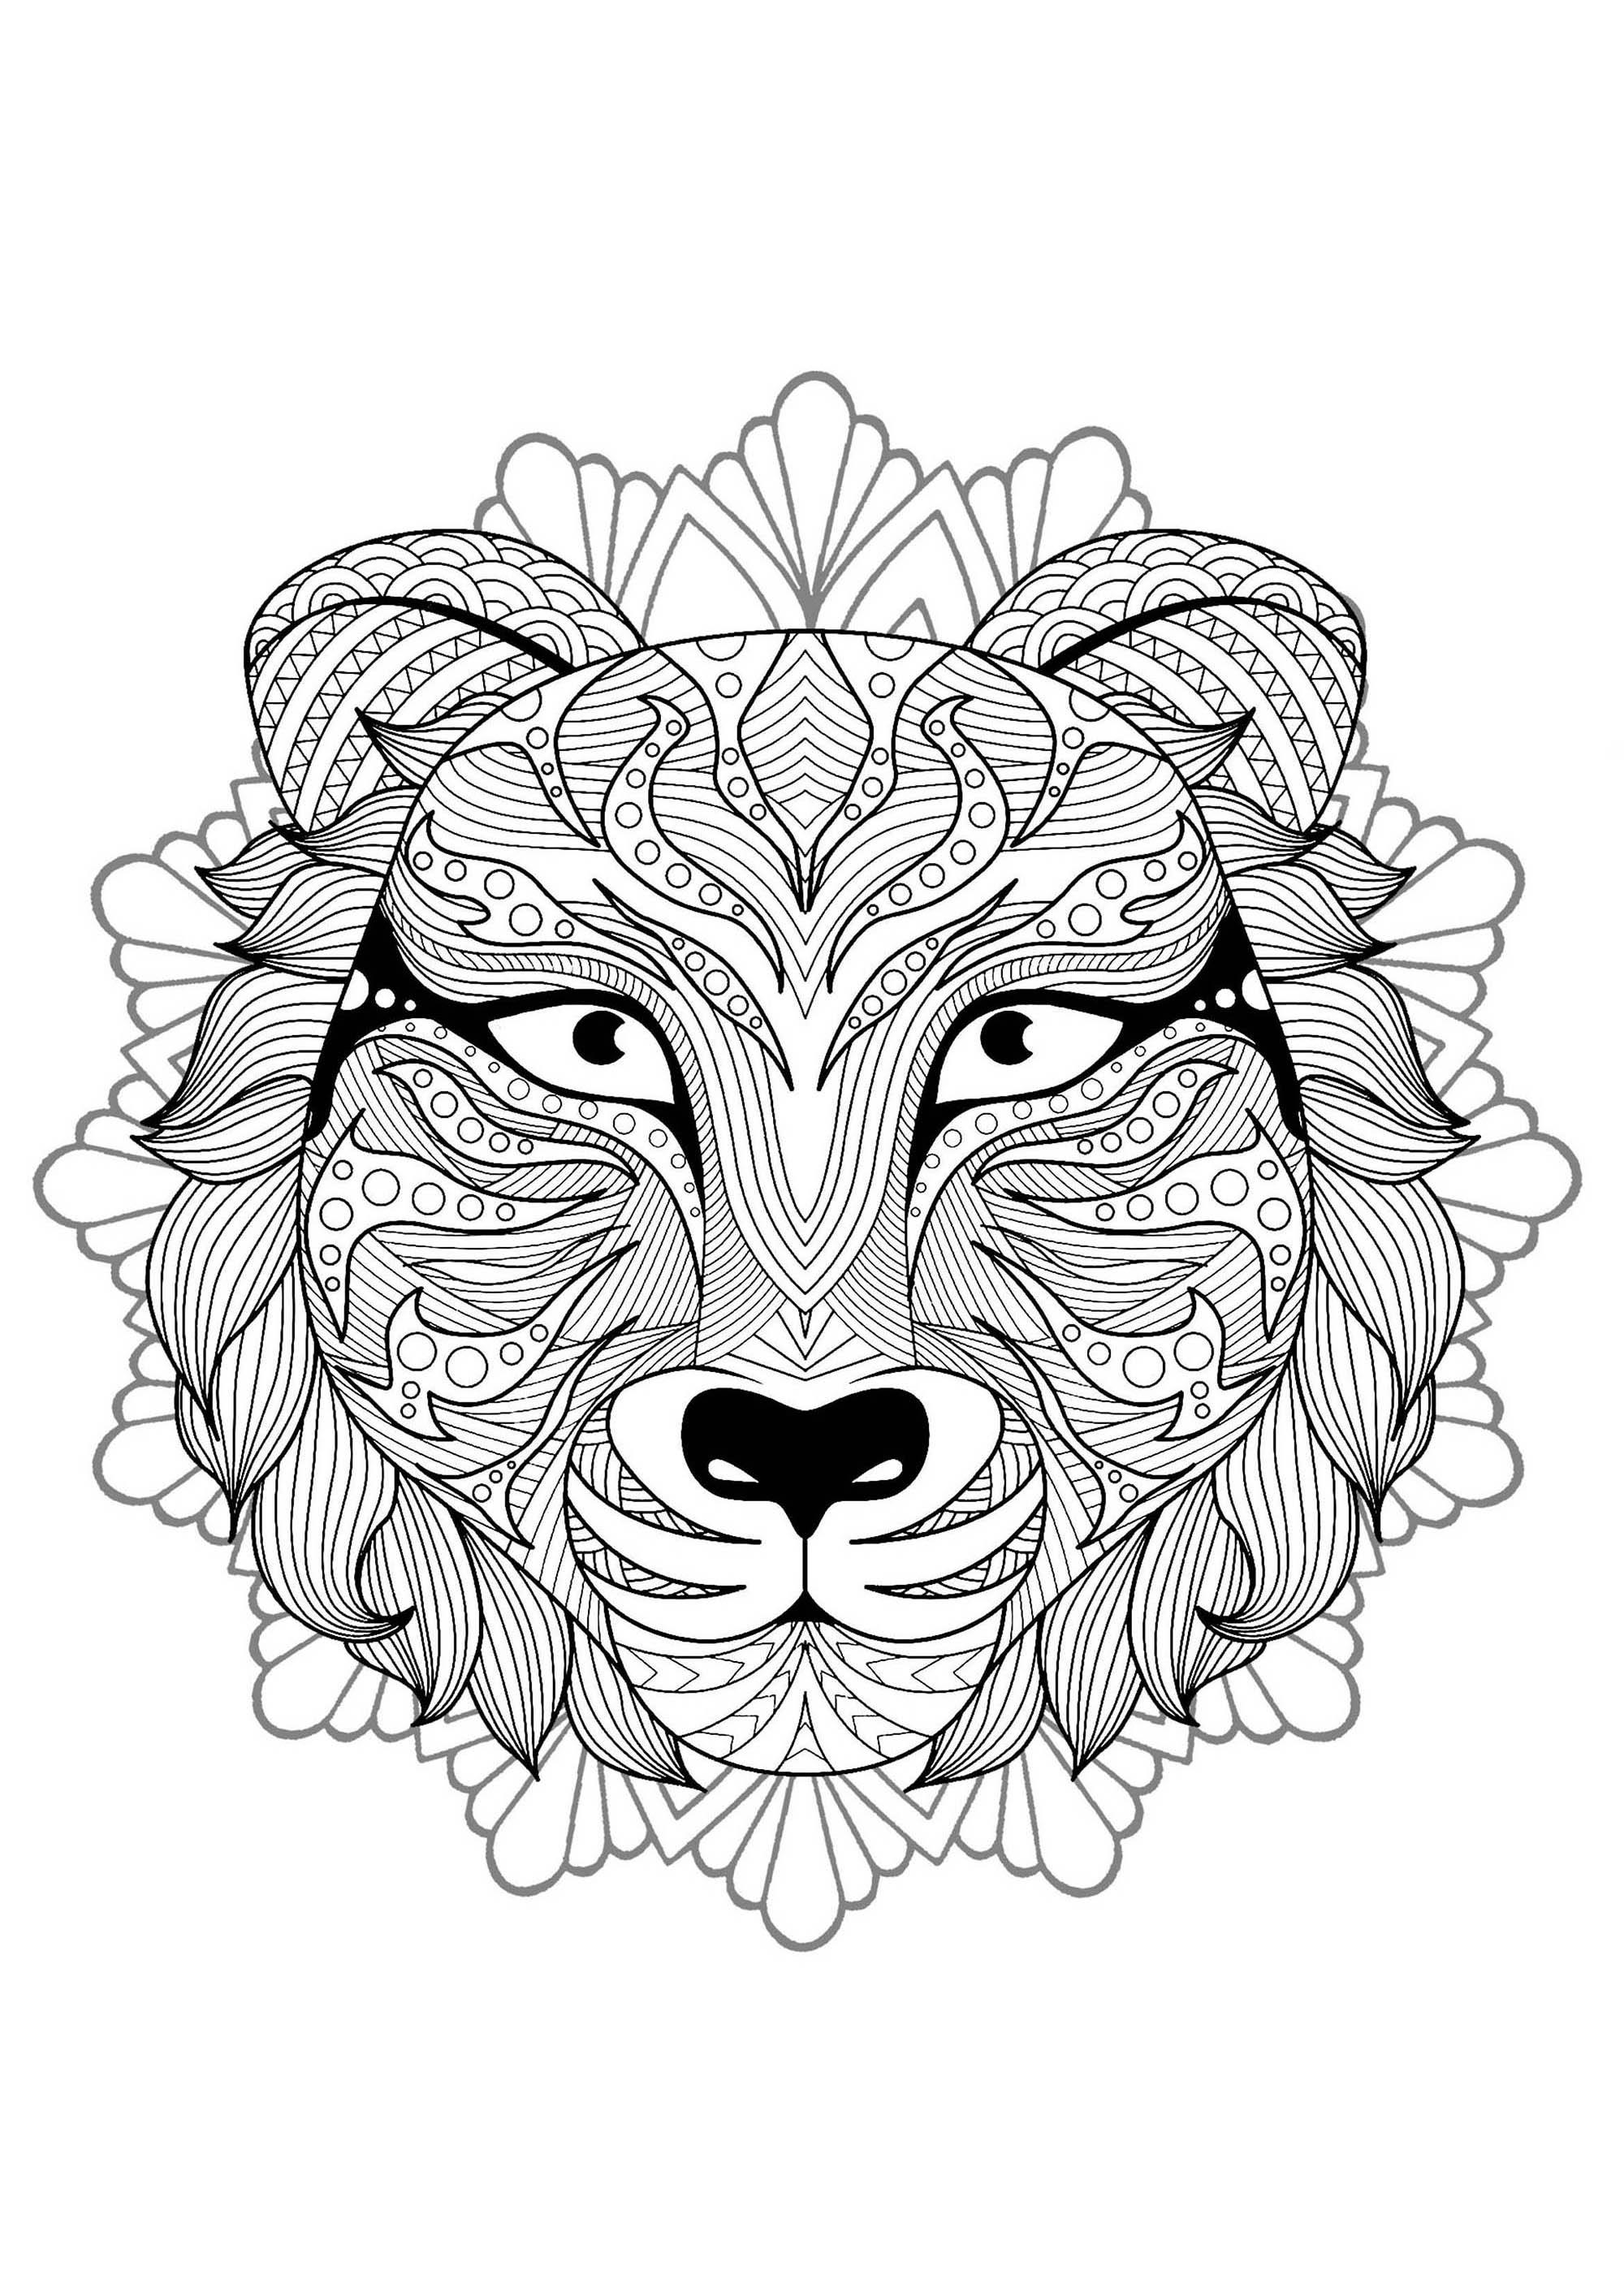 Mandala tete tigre 3 mandalas coloriages difficiles - Coloriages mandalas ...